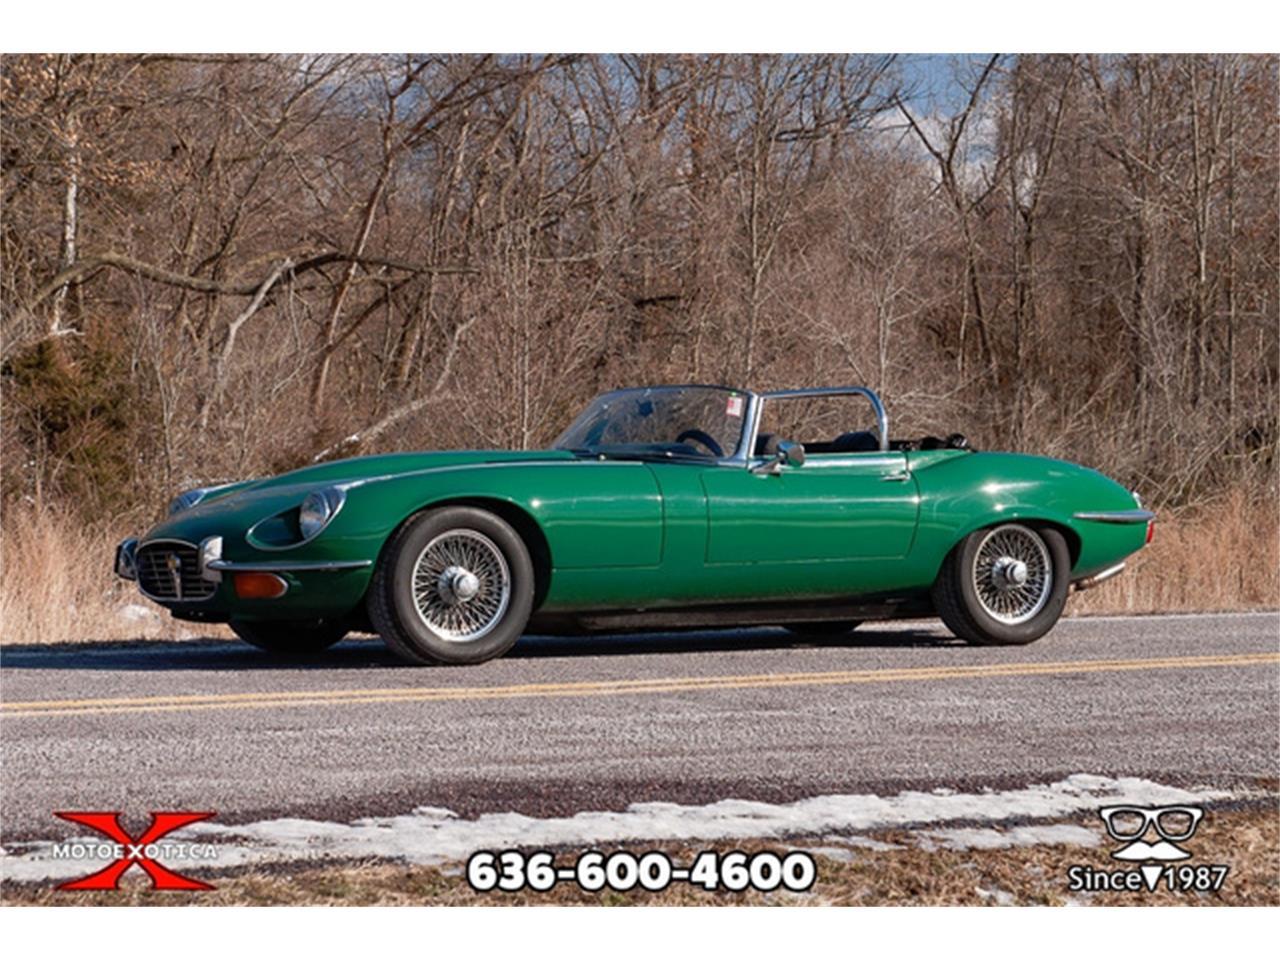 Large Picture of Classic 1971 Jaguar E-Type located in St. Louis Missouri - $36,900.00 - QXK8